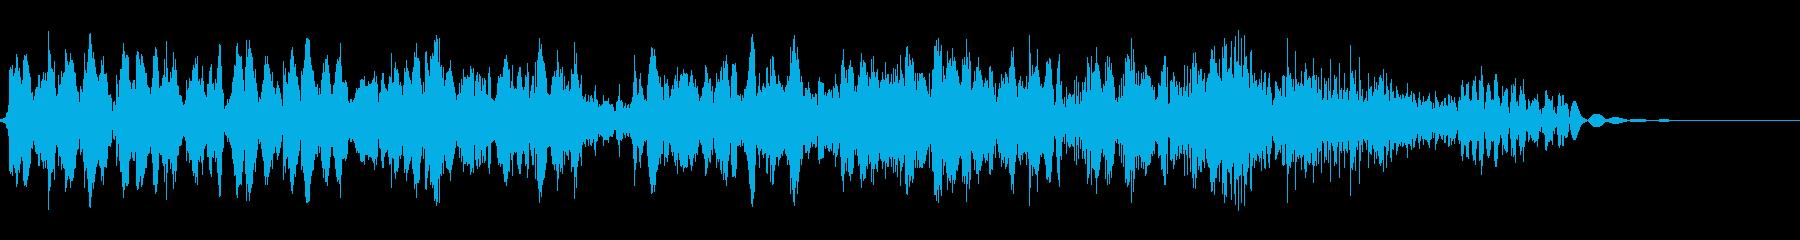 EC04_38_4を巻き戻すの再生済みの波形